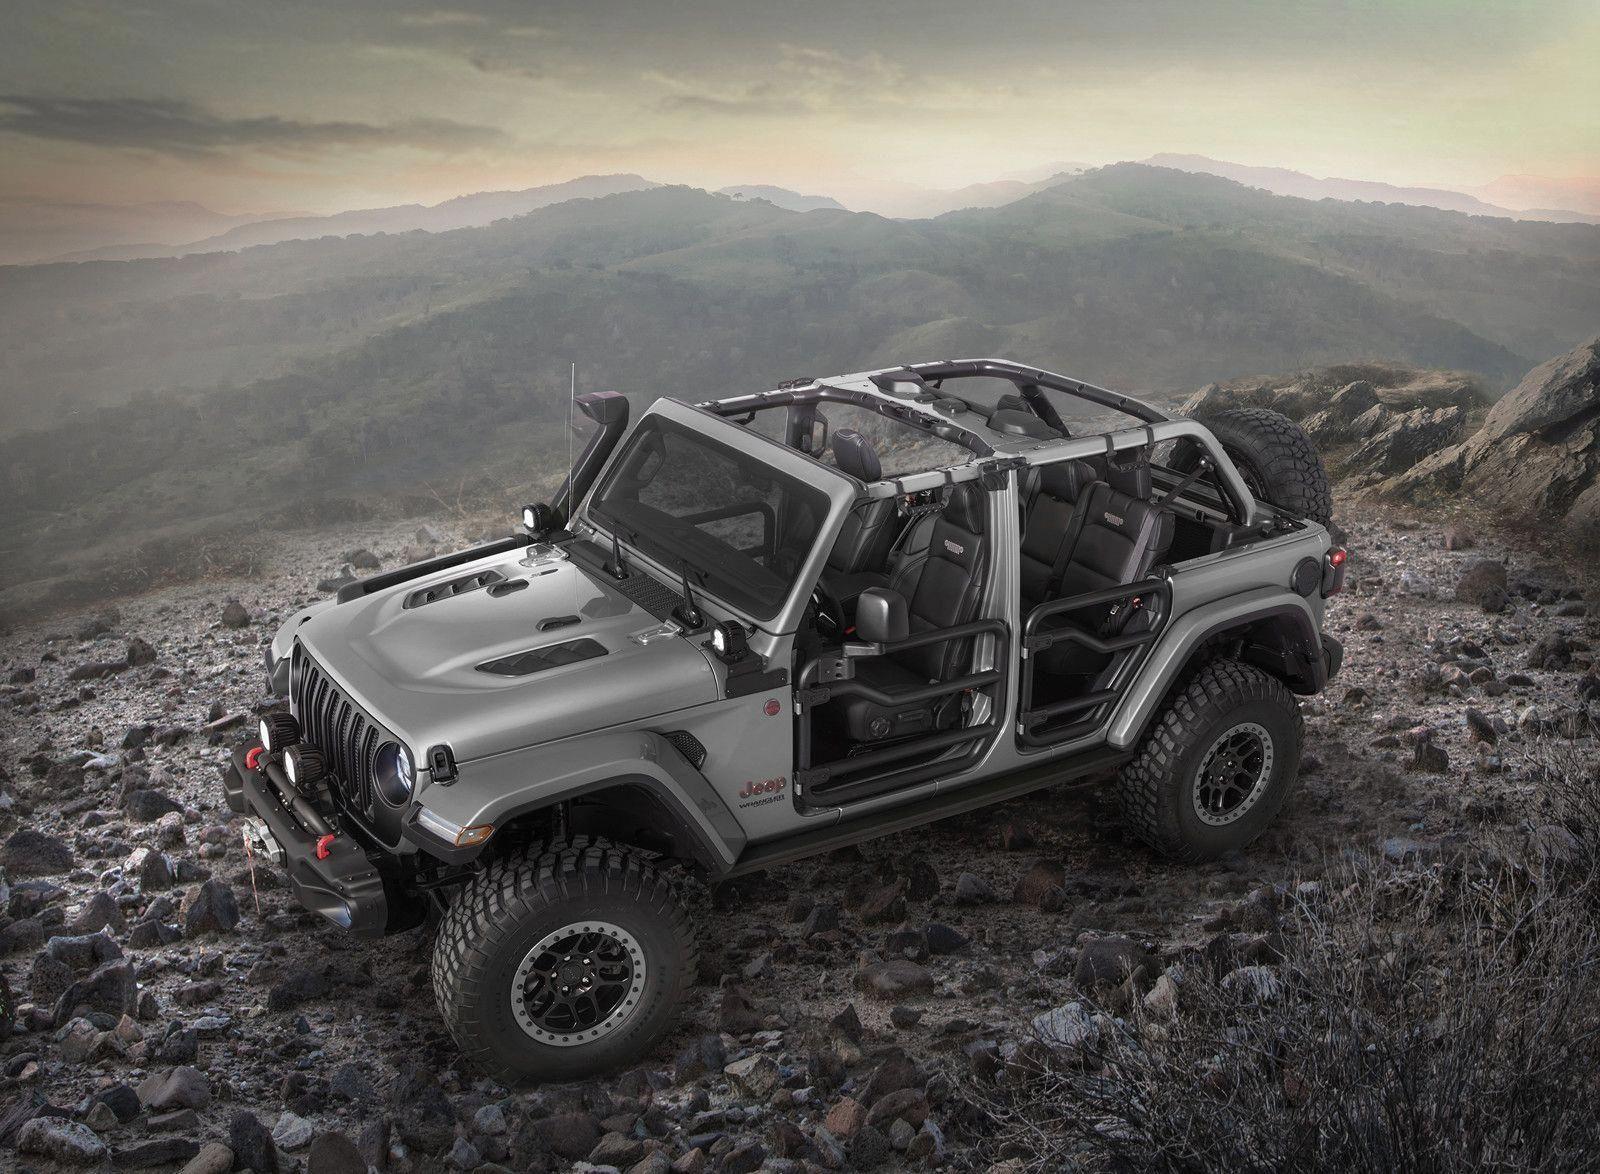 Billet Silver Wrangler Jl Club 2018 Jeep Wrangler Forums Jl Jt Pickup Truck Rubicon Sahara Sport Unlimited Jlwrang Jeep Wrangler Mopar Jeep Jeep